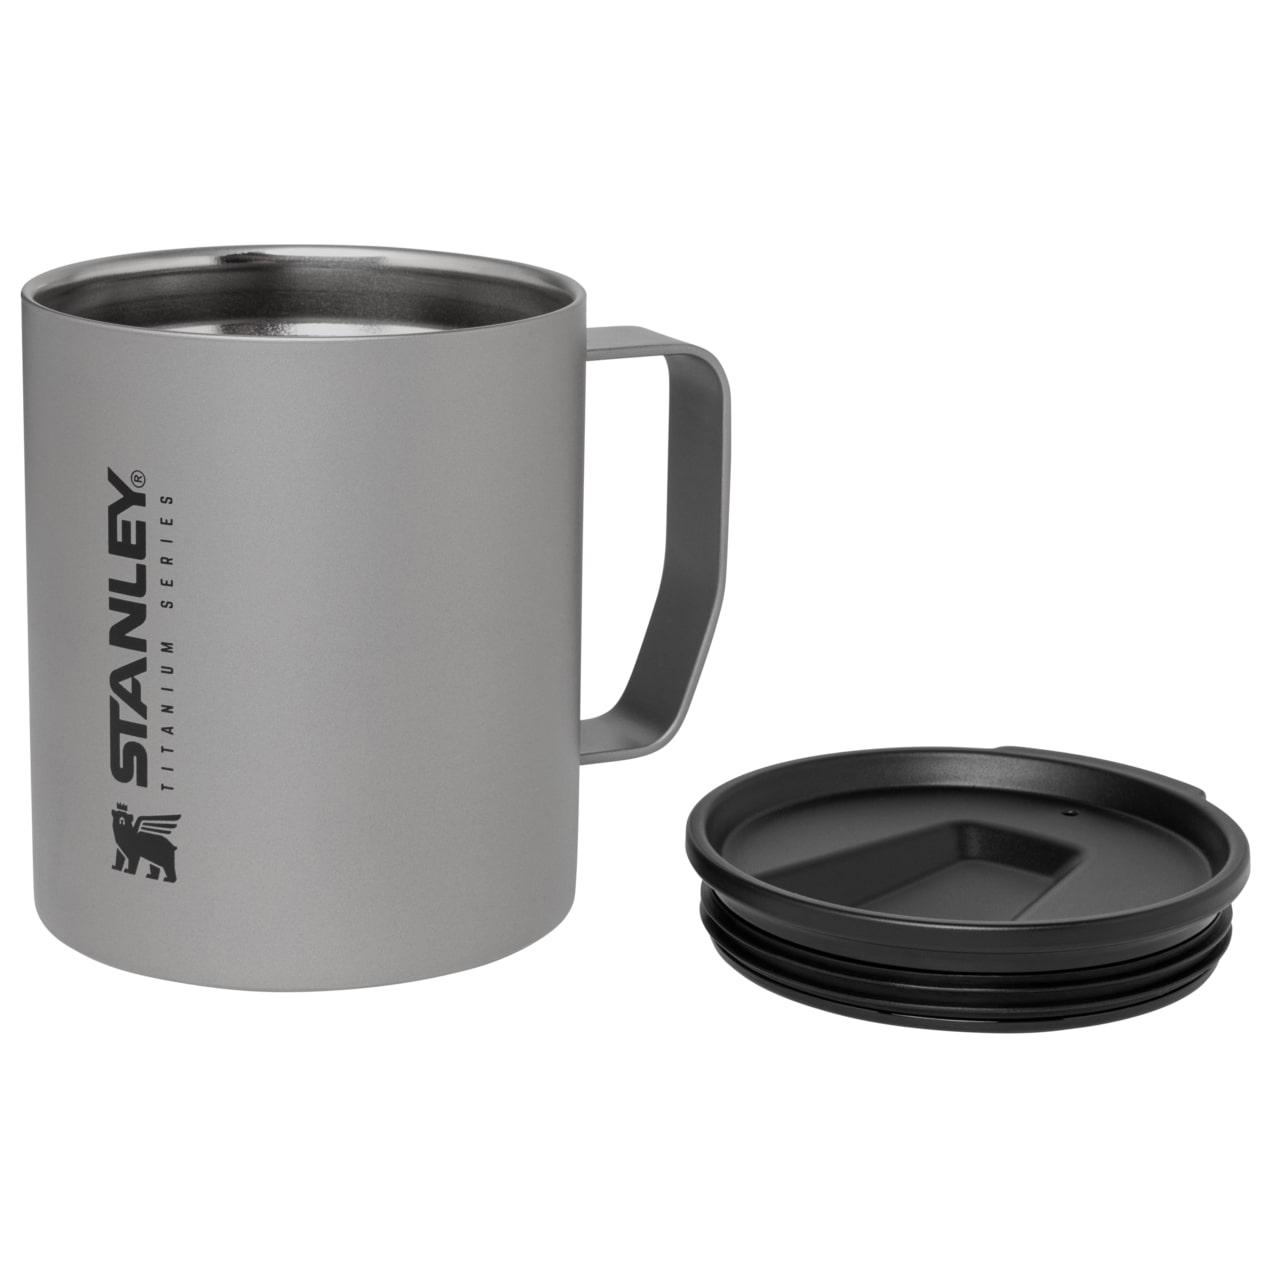 Stanley The Stay-Hot Titanium Camp Mug - 12OZ